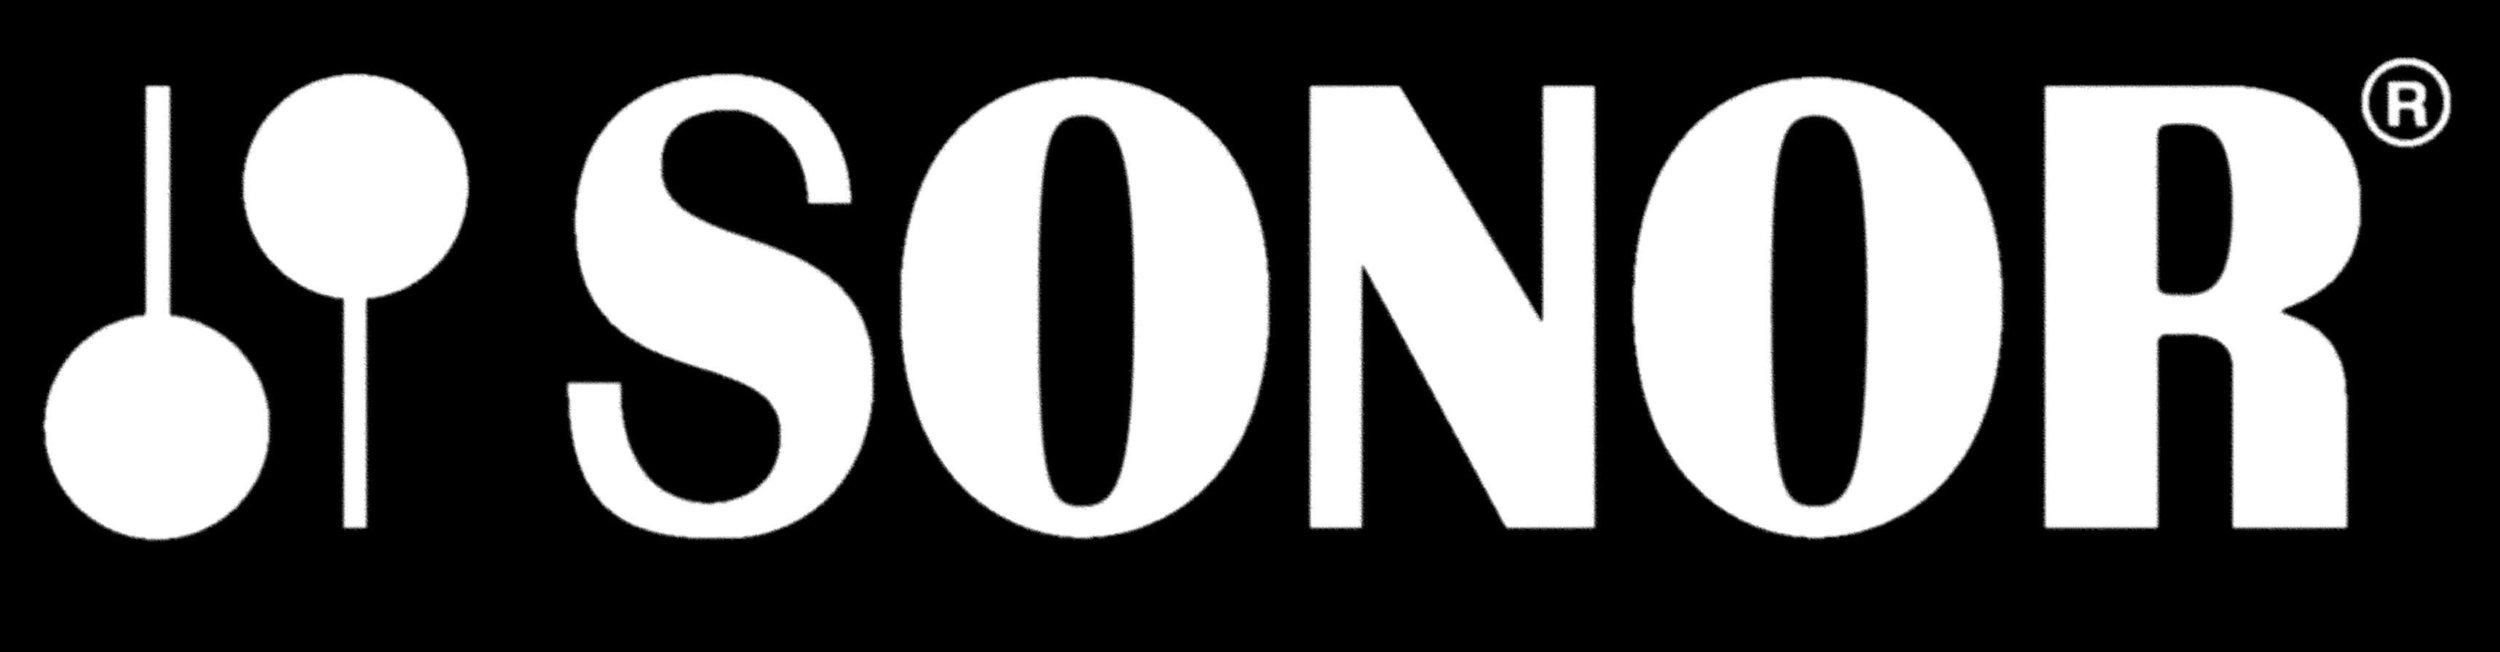 sonor_logo.jpg